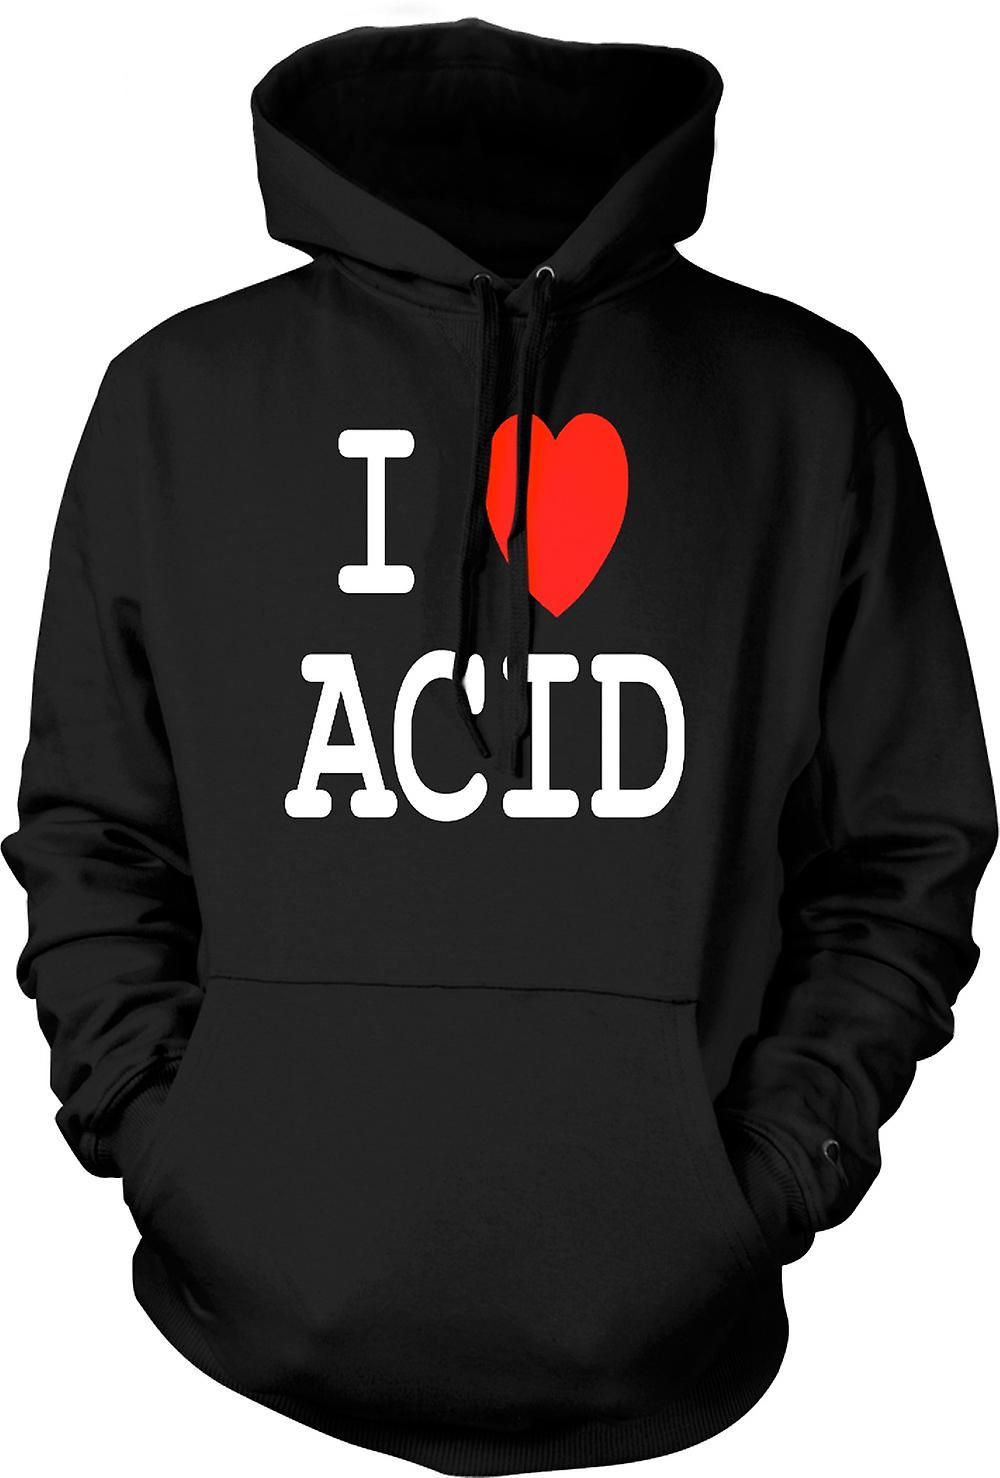 Felpa con cappuccio uomo - amo cuore acido - divertente